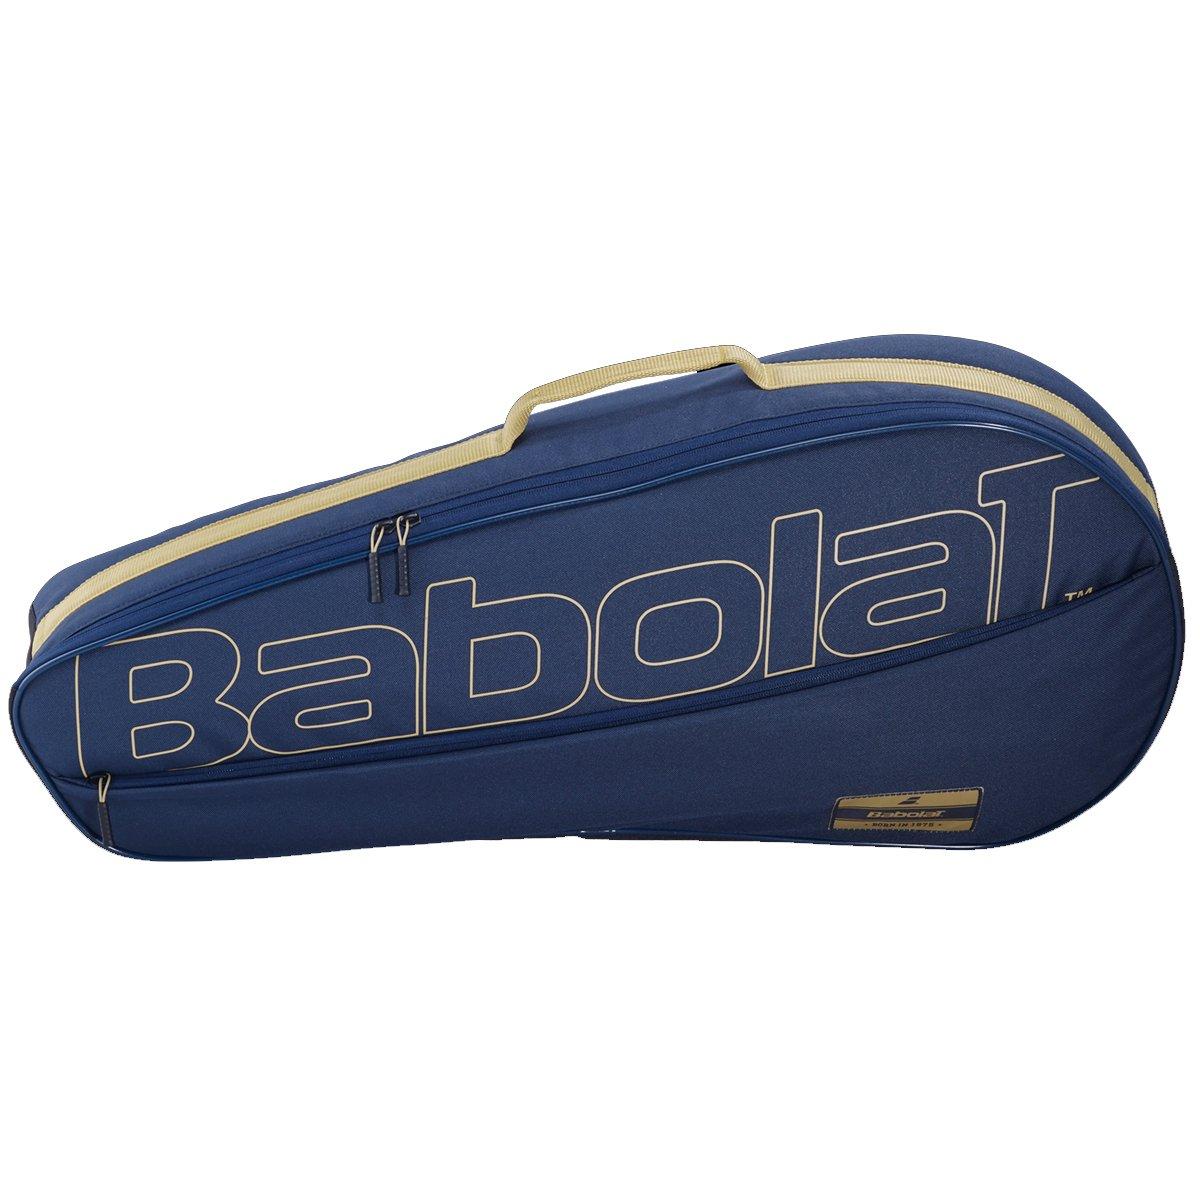 Raqueteira Babolat Racket Holder CLUB X3 Marinho